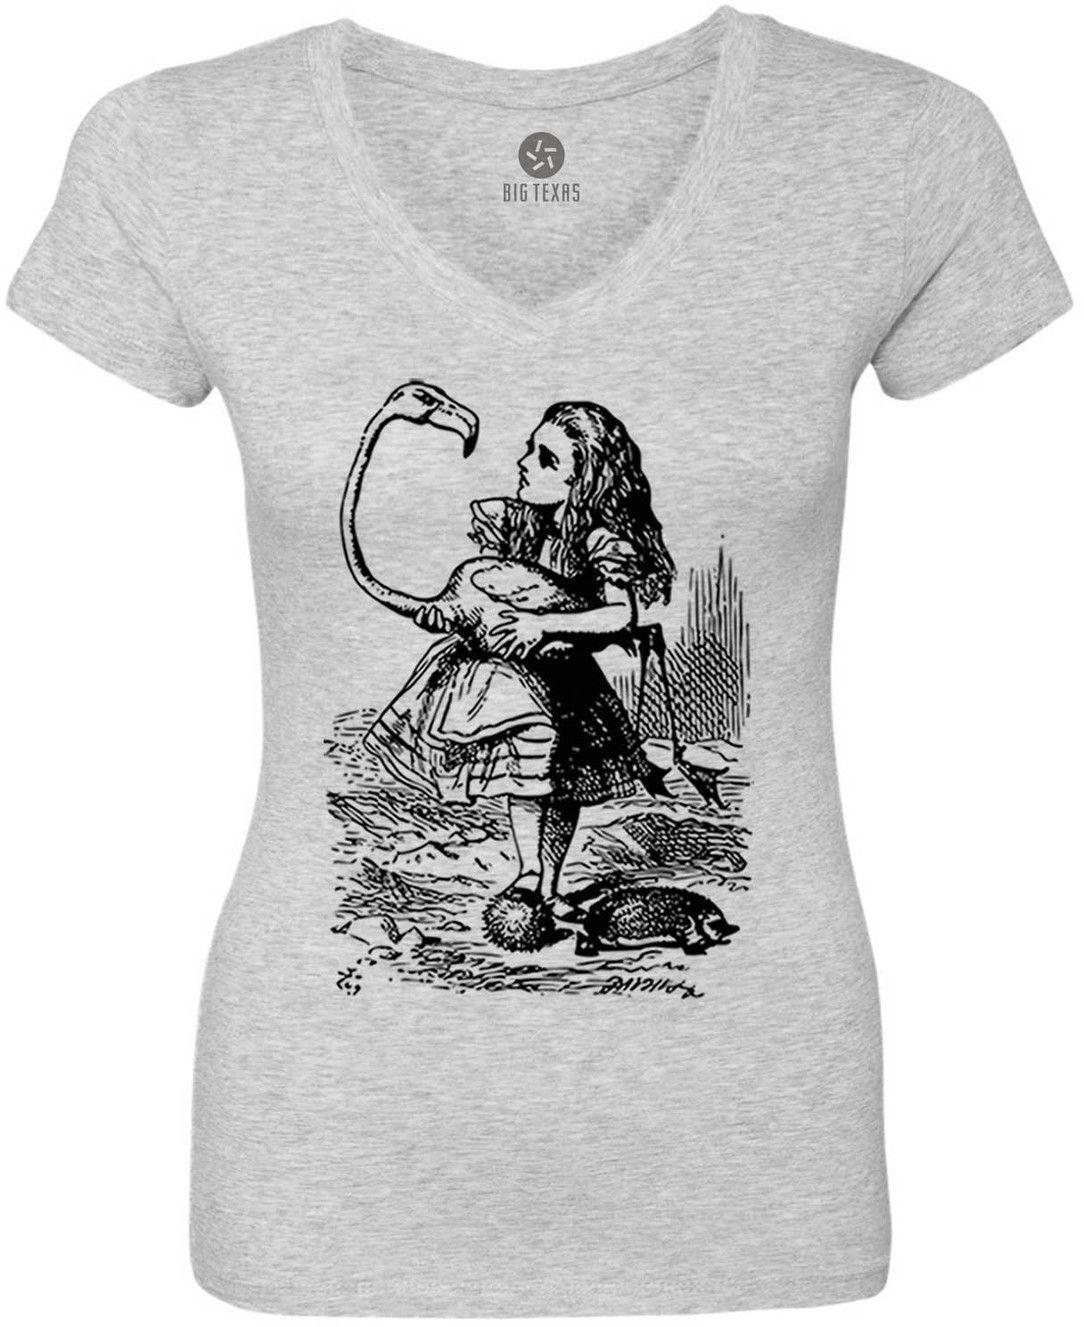 Alice in Wonderland - Alice Flamingo Croquet (Black) Women's Short-Sleeve V-Neck T-Shirt